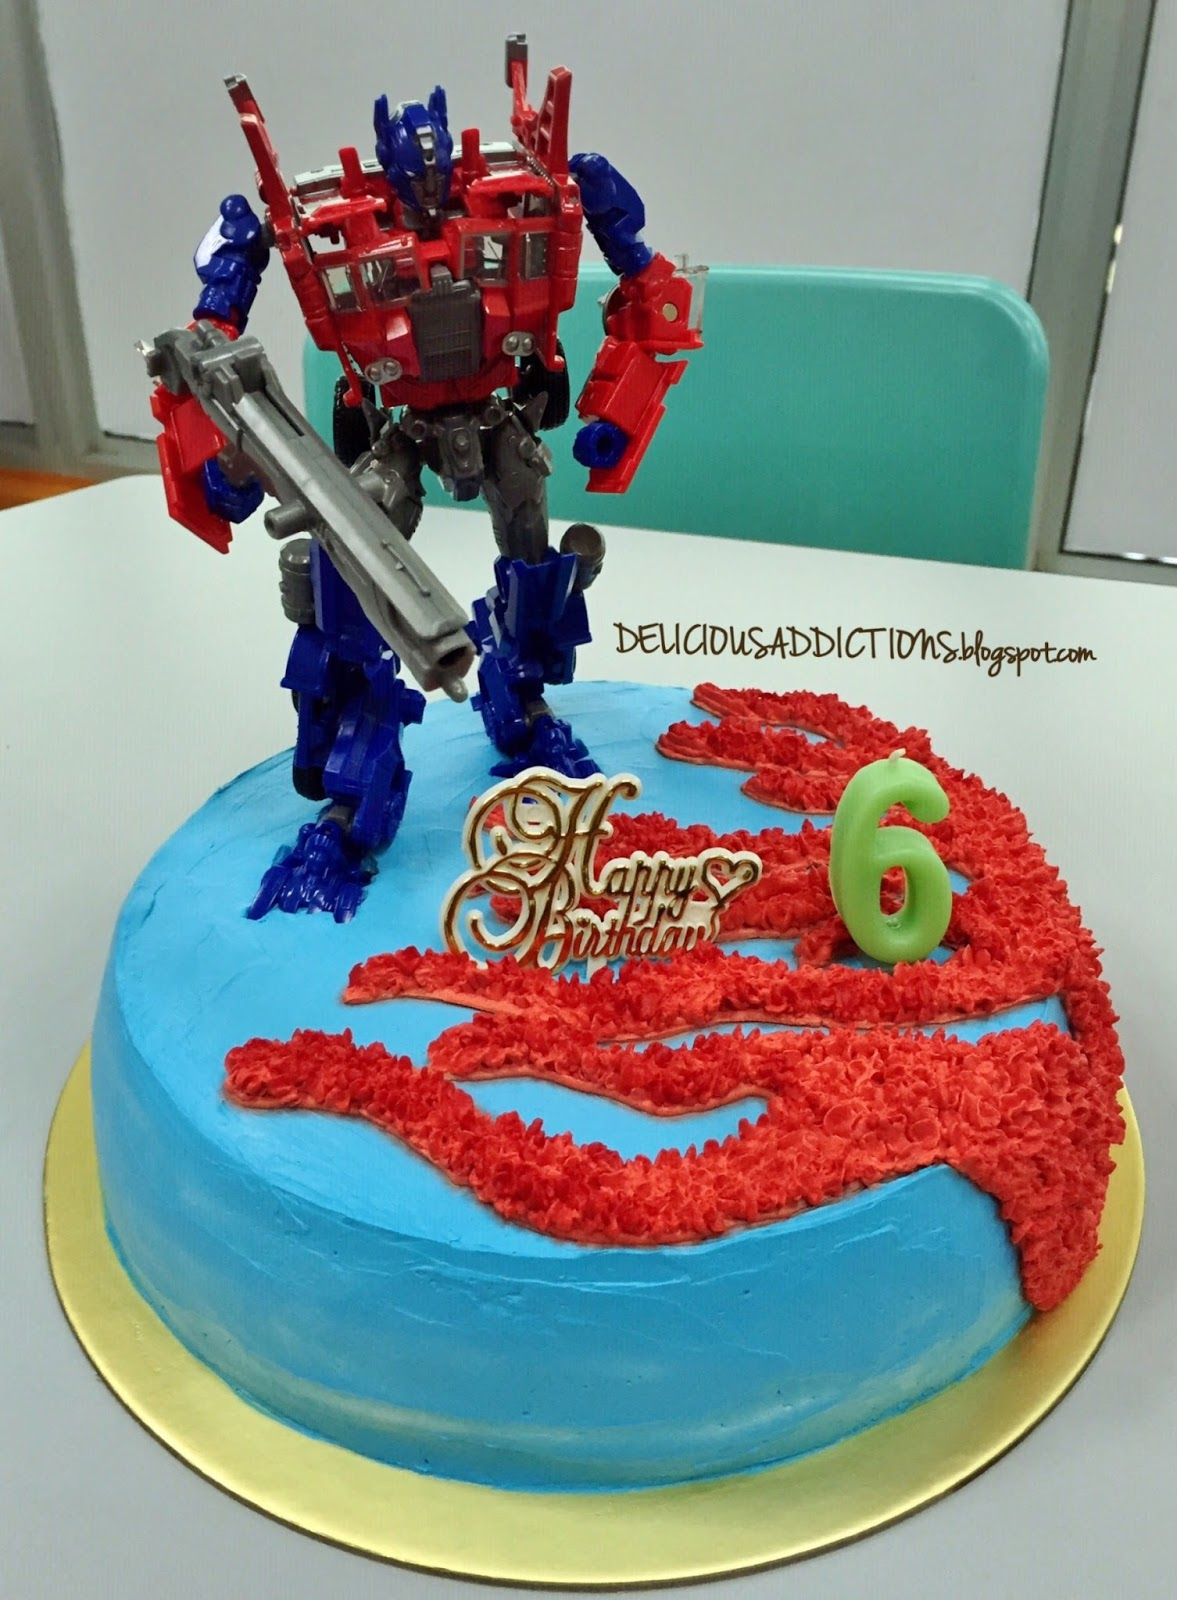 Delicious Addictions Happy 6th Birthday Ovann